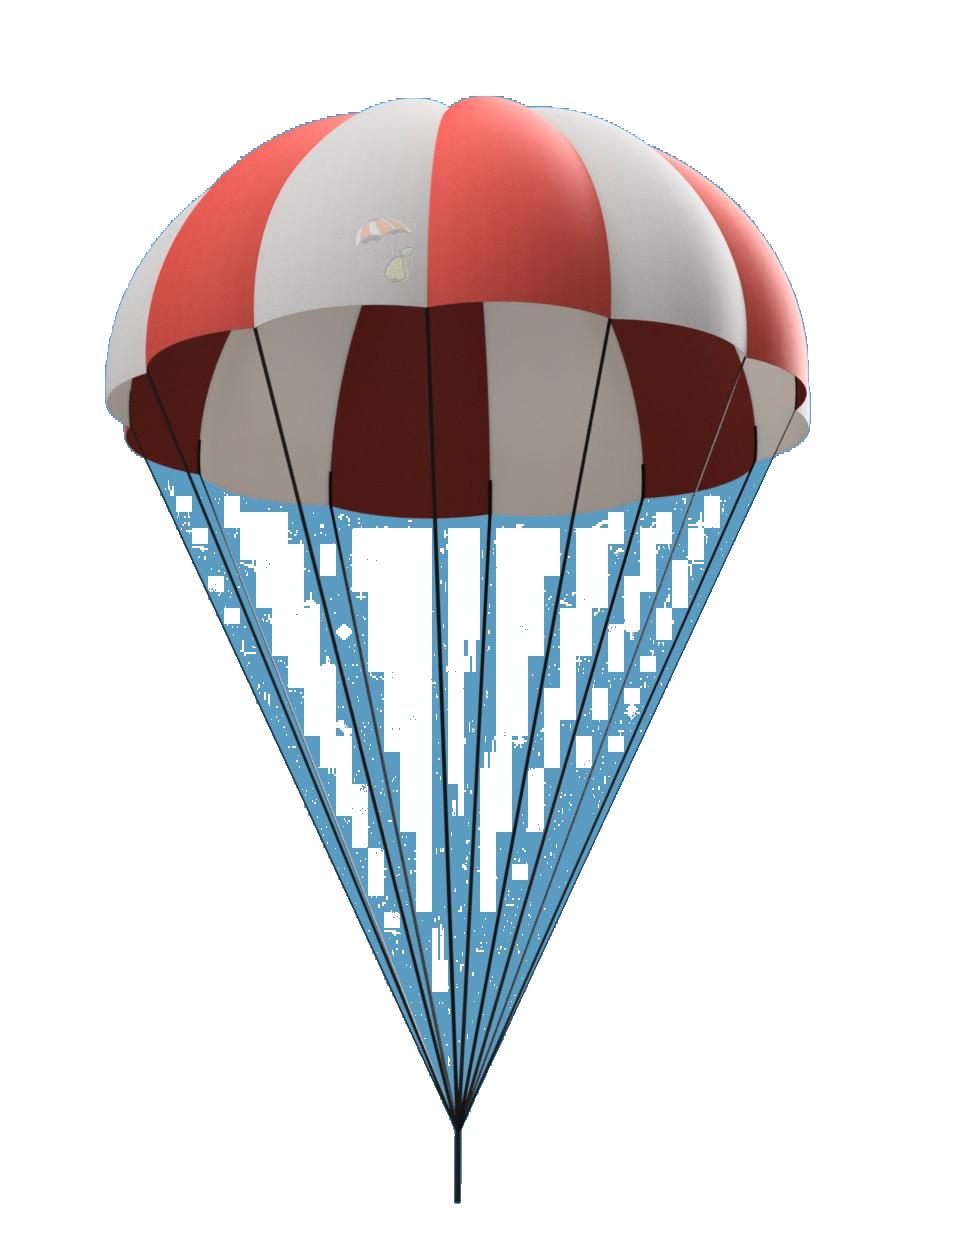 Parachute PNG Free Image Download.